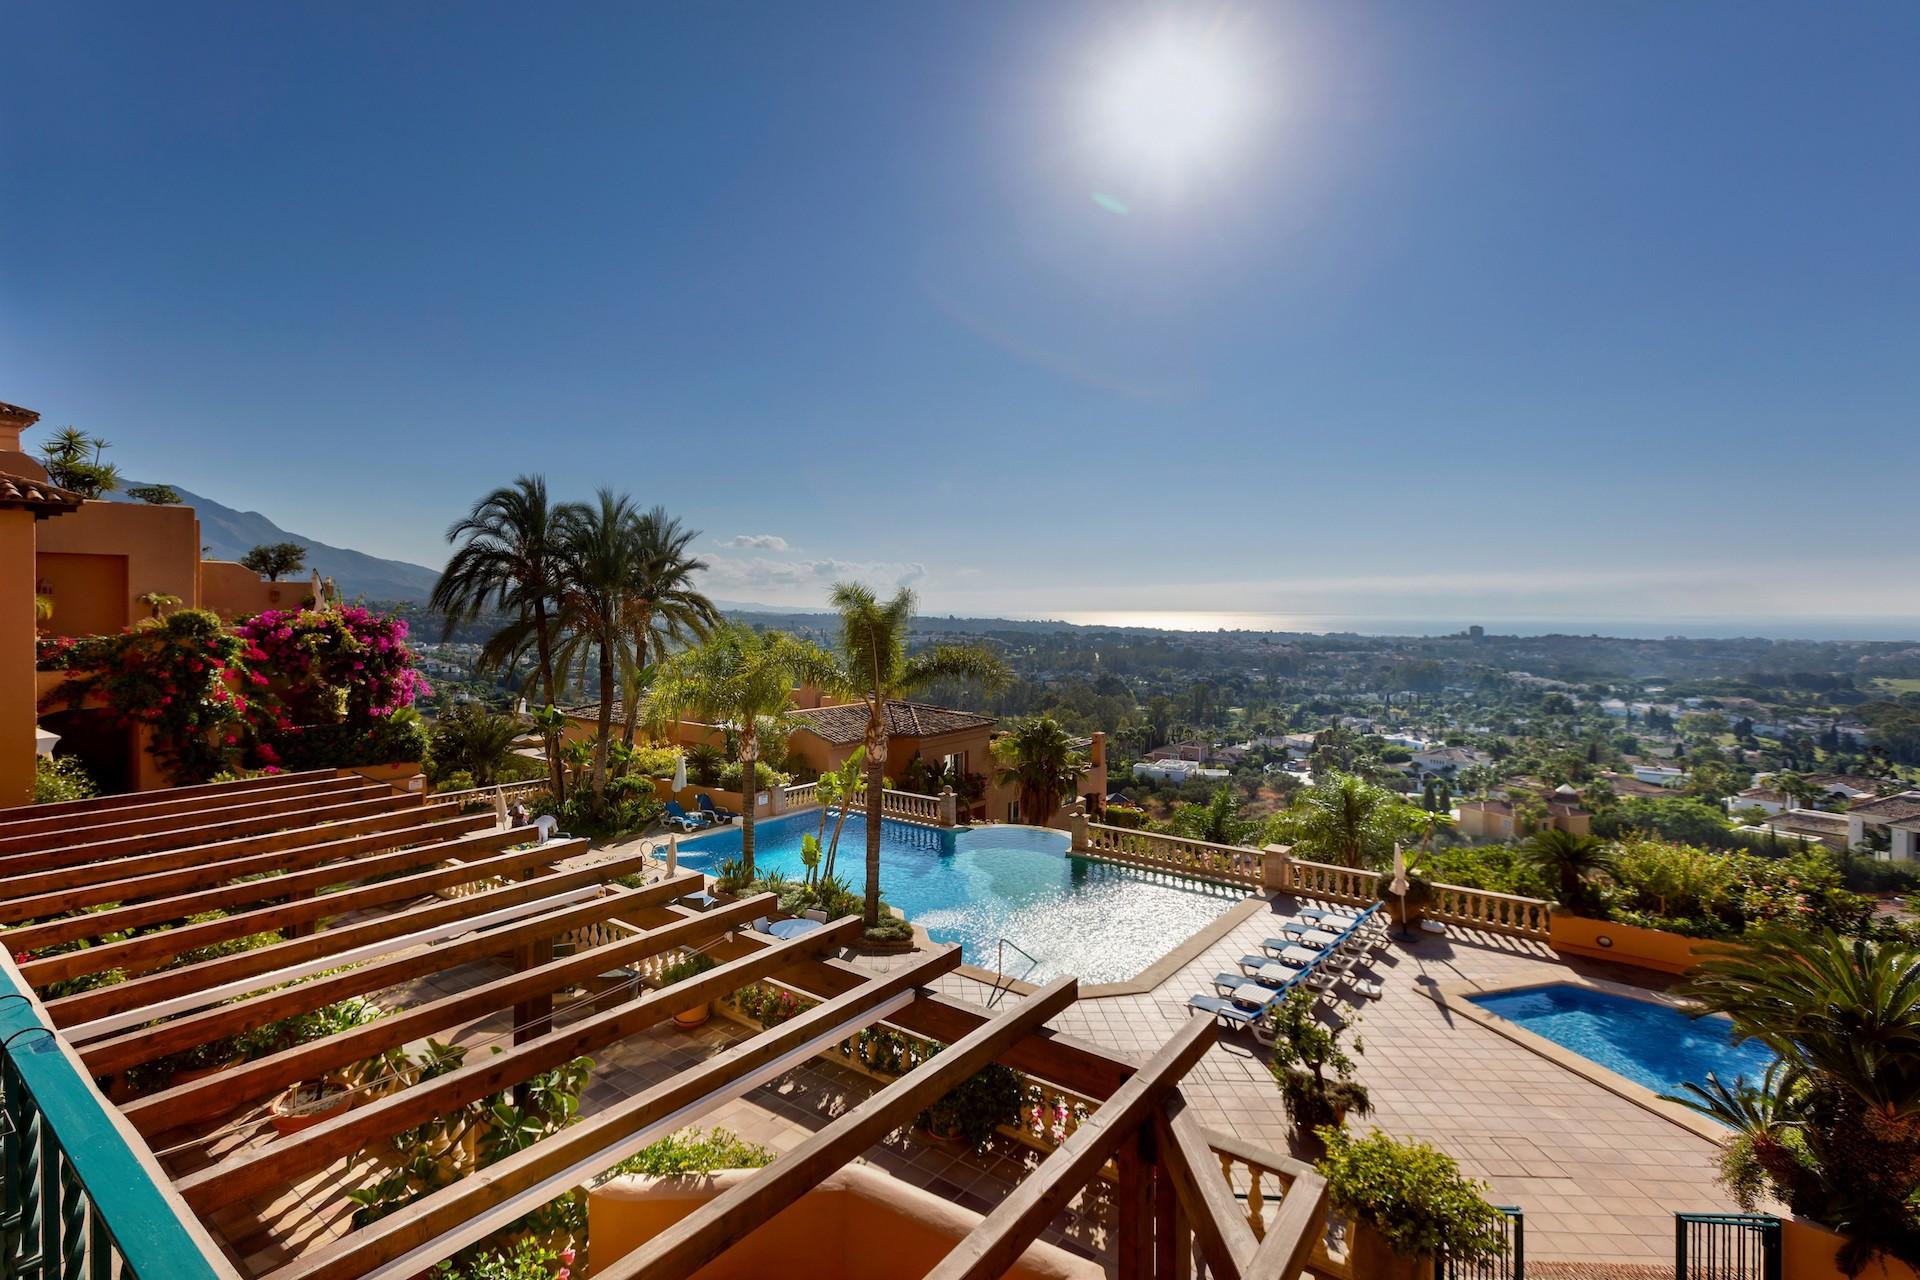 Marbella's balanced property market